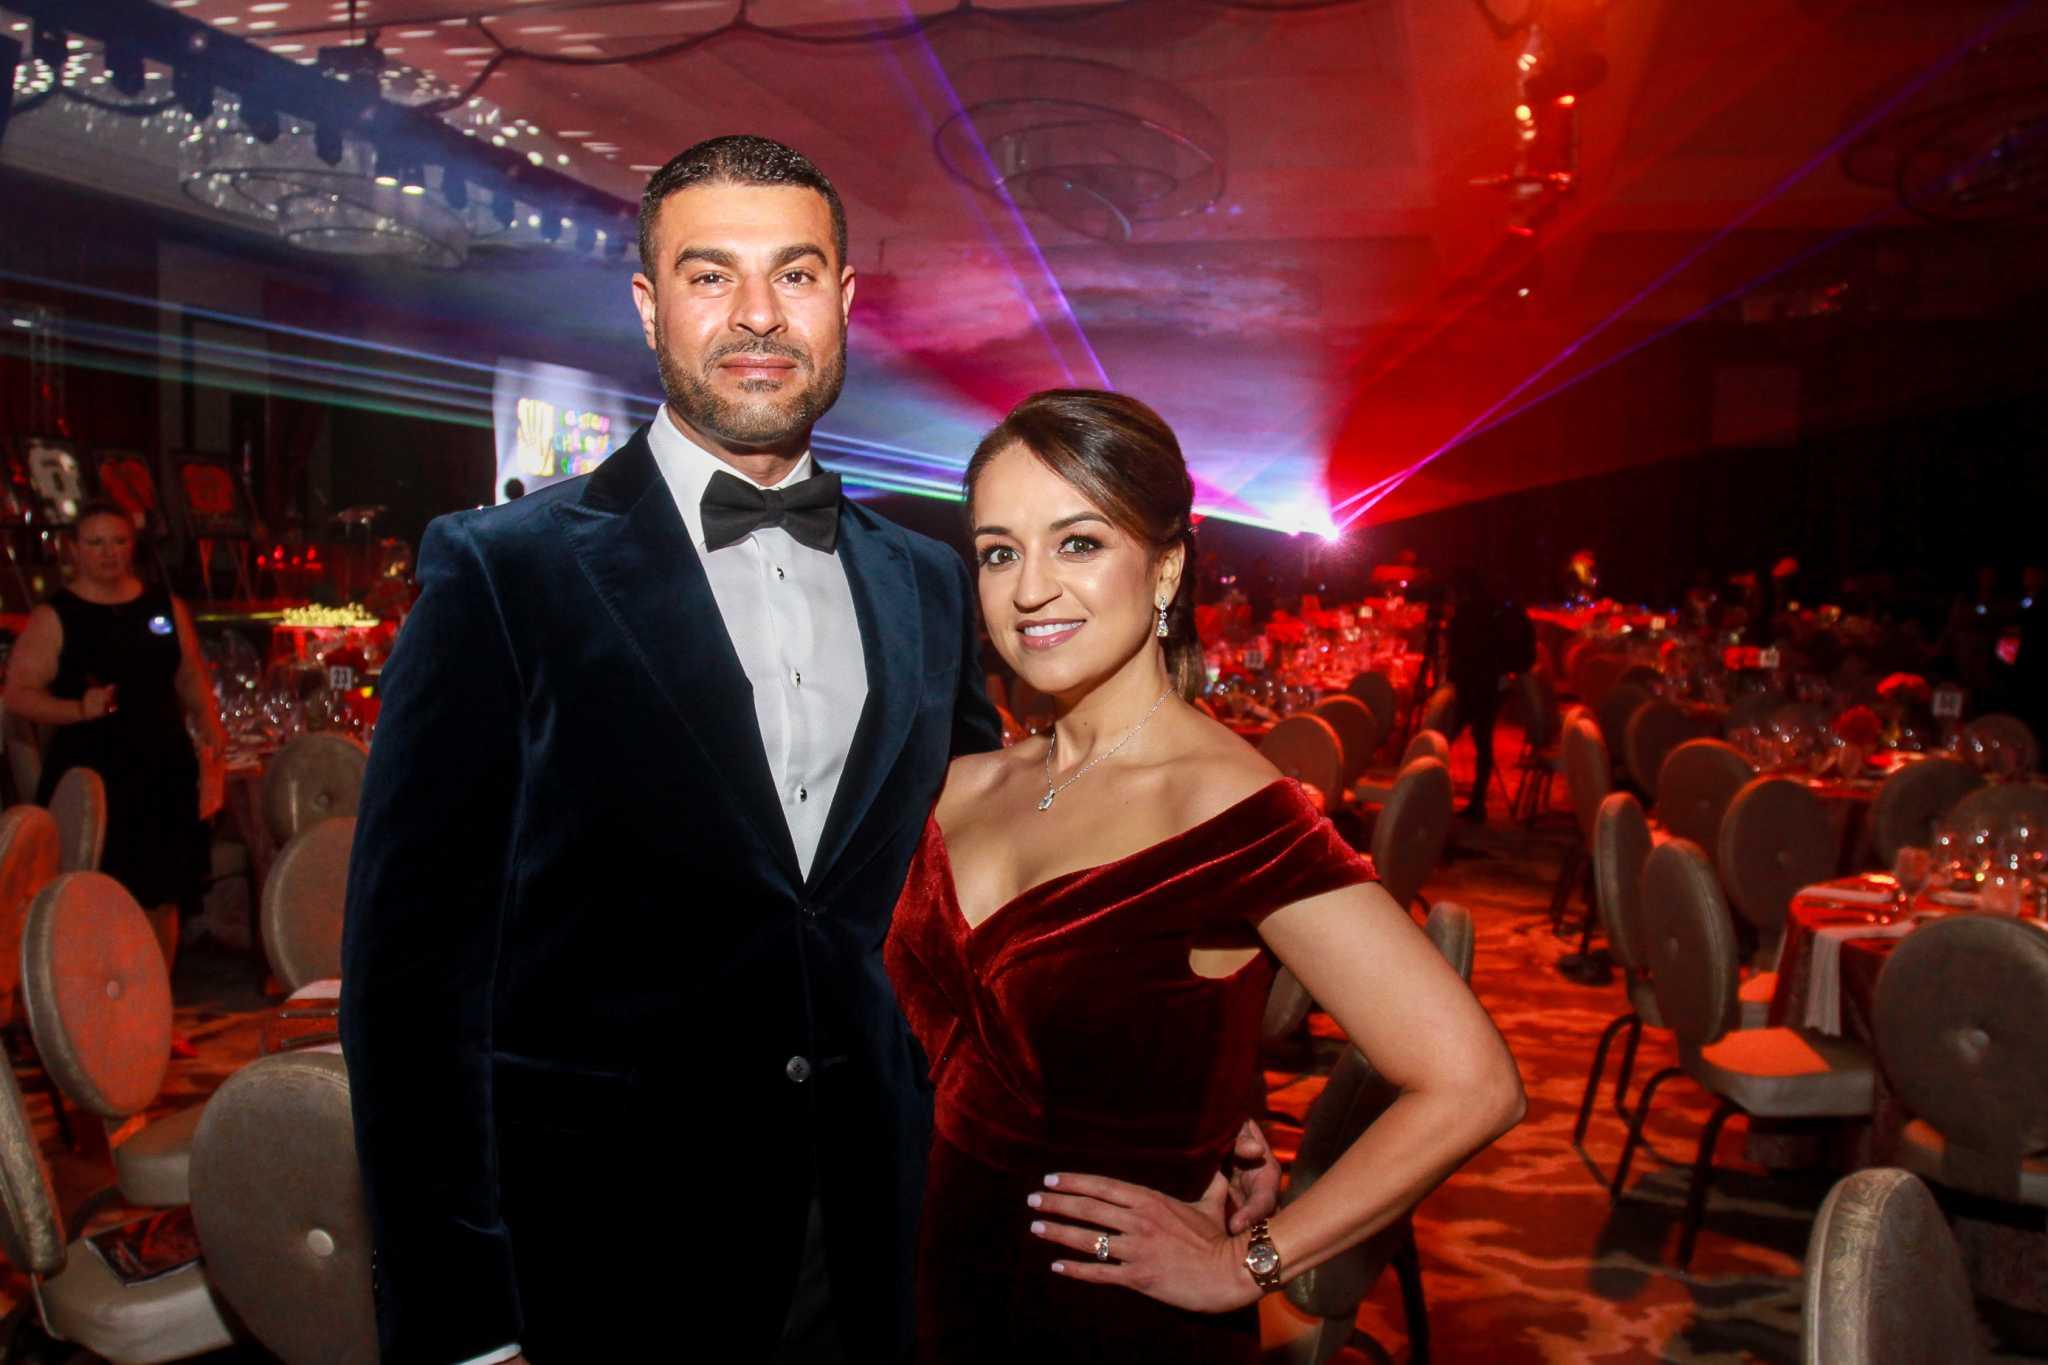 Sneak peek: Styx performs, Tony Buzbee wins second six-figure BMW at Houston Children's Charity gala